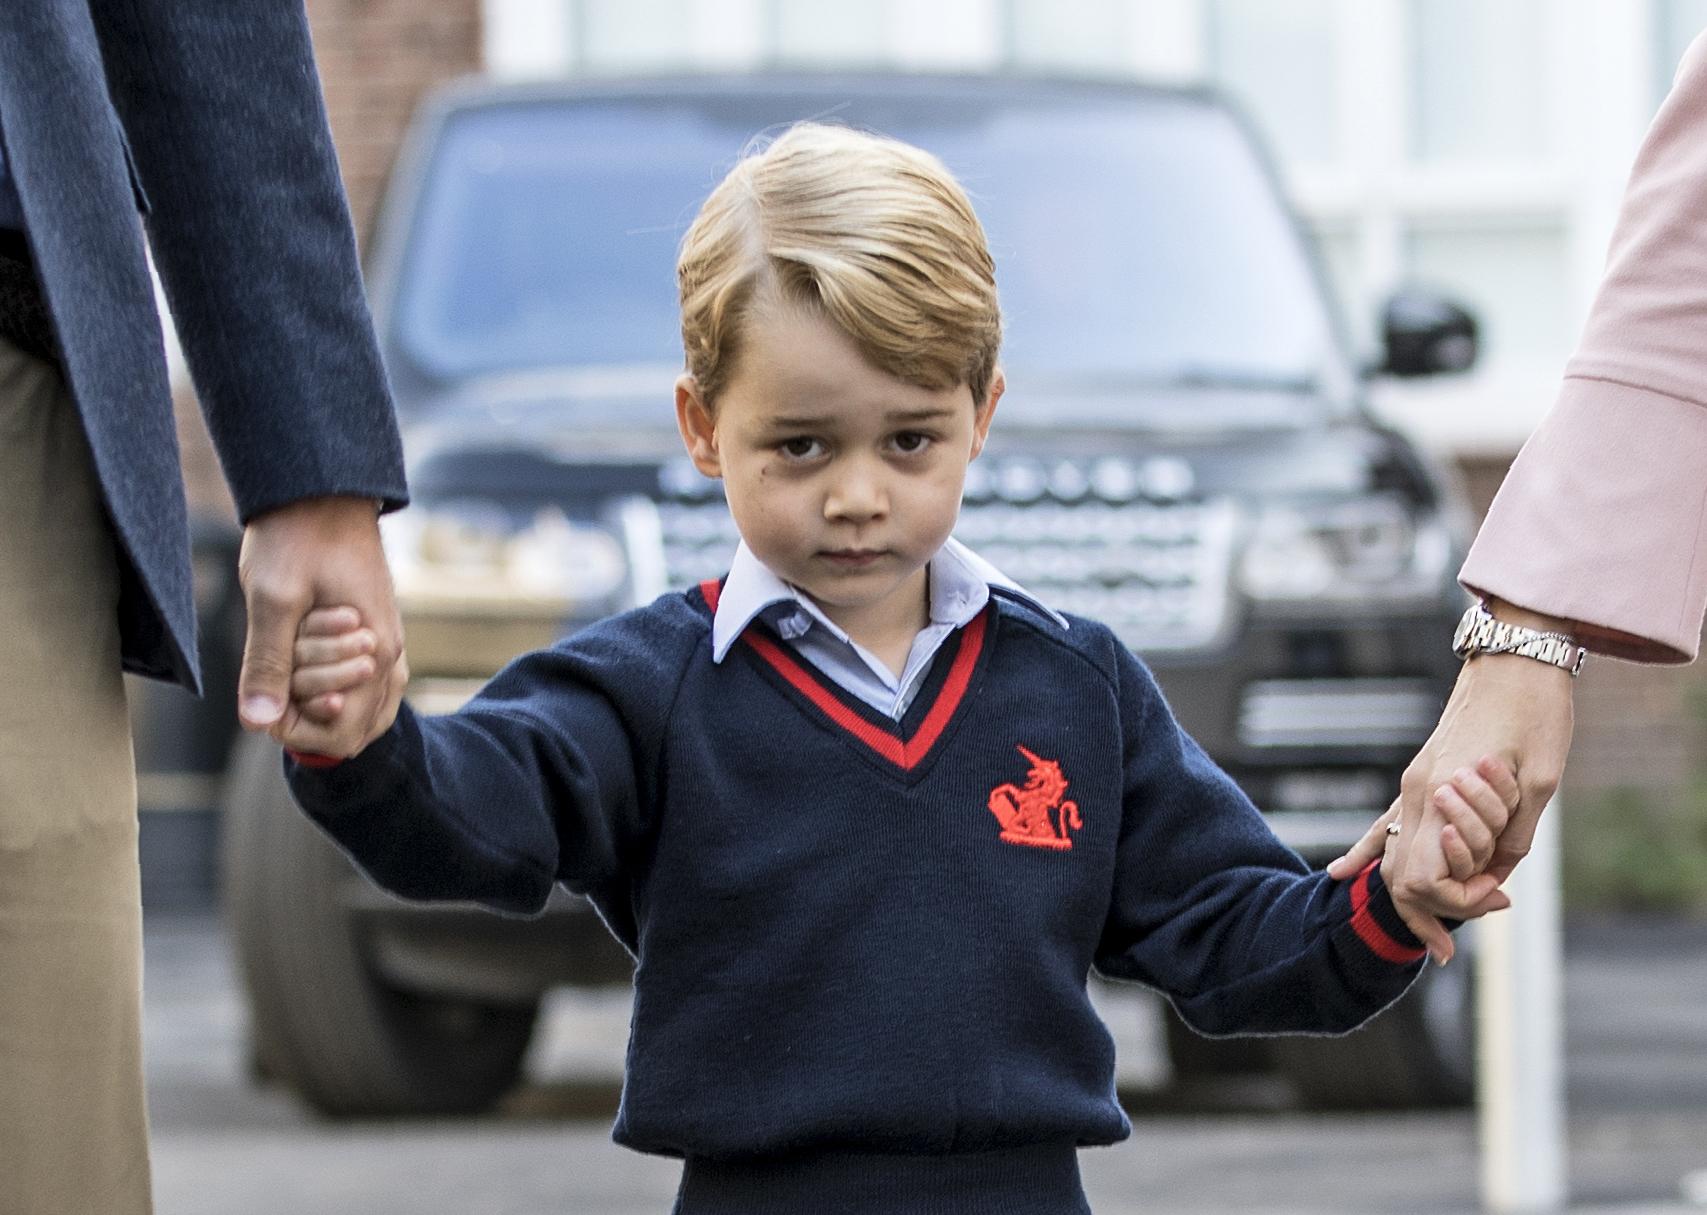 喬治小王子本月7日上學。Getty Images